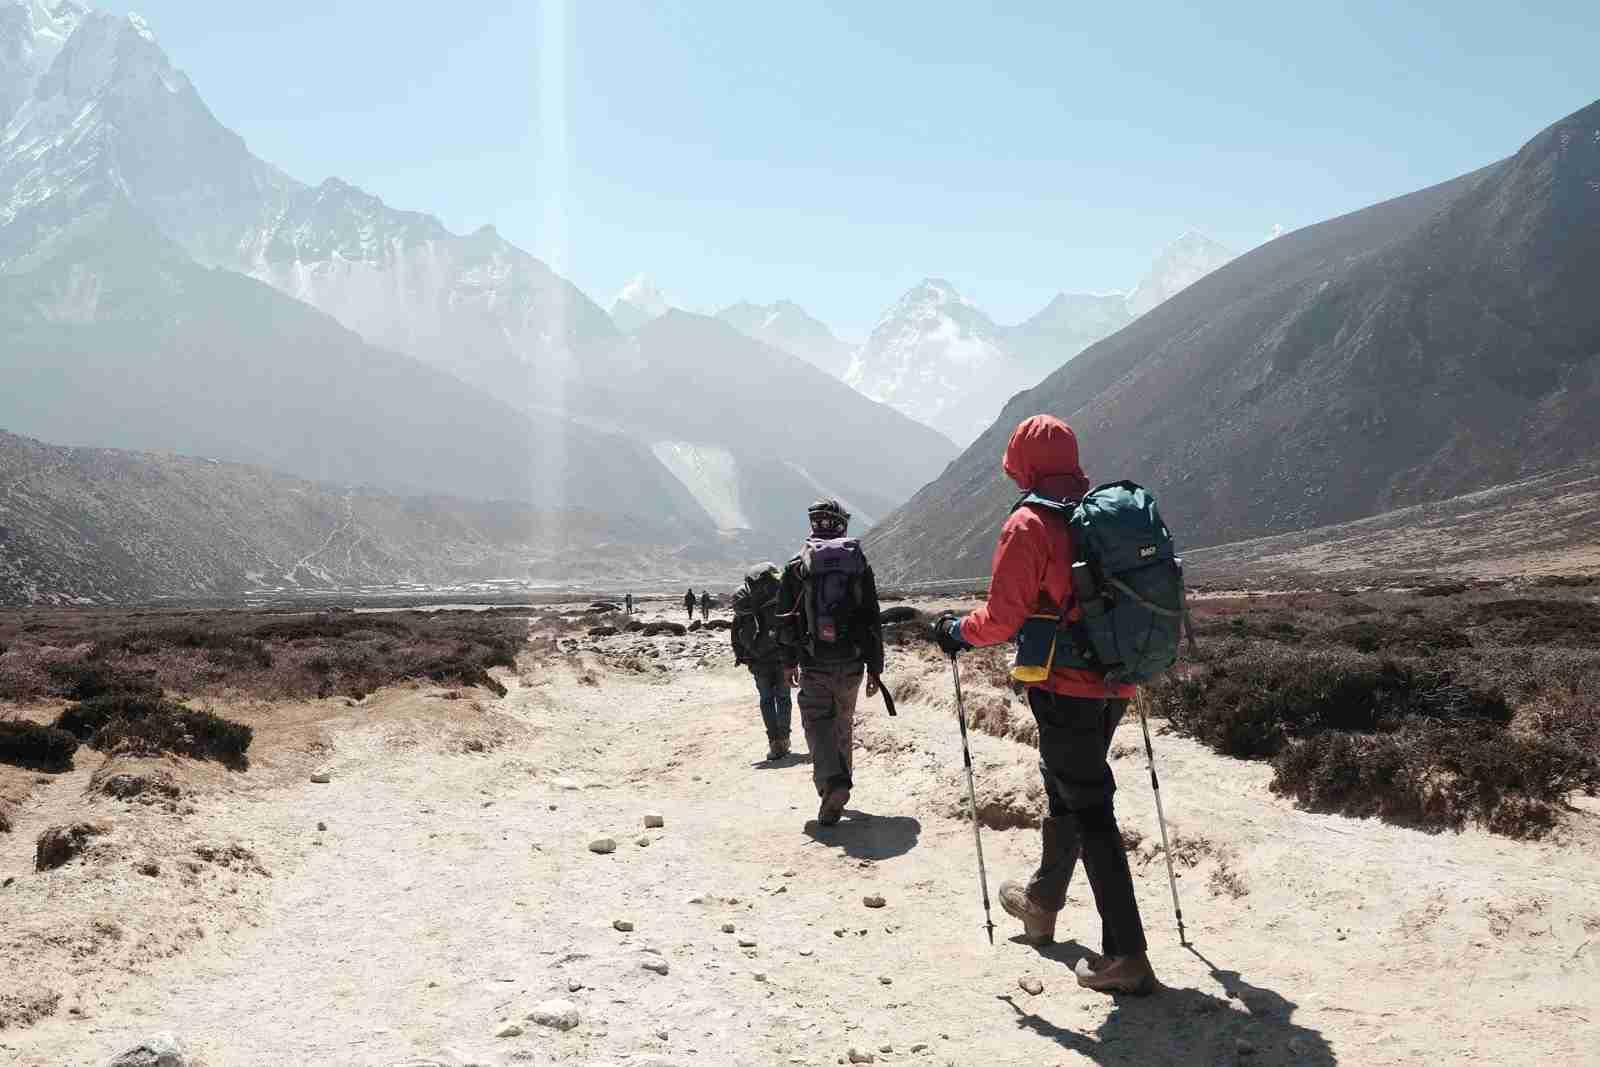 The Kala Patthar Peak on Mount Everest. (Photo by Ted Bryan / Unsplash)